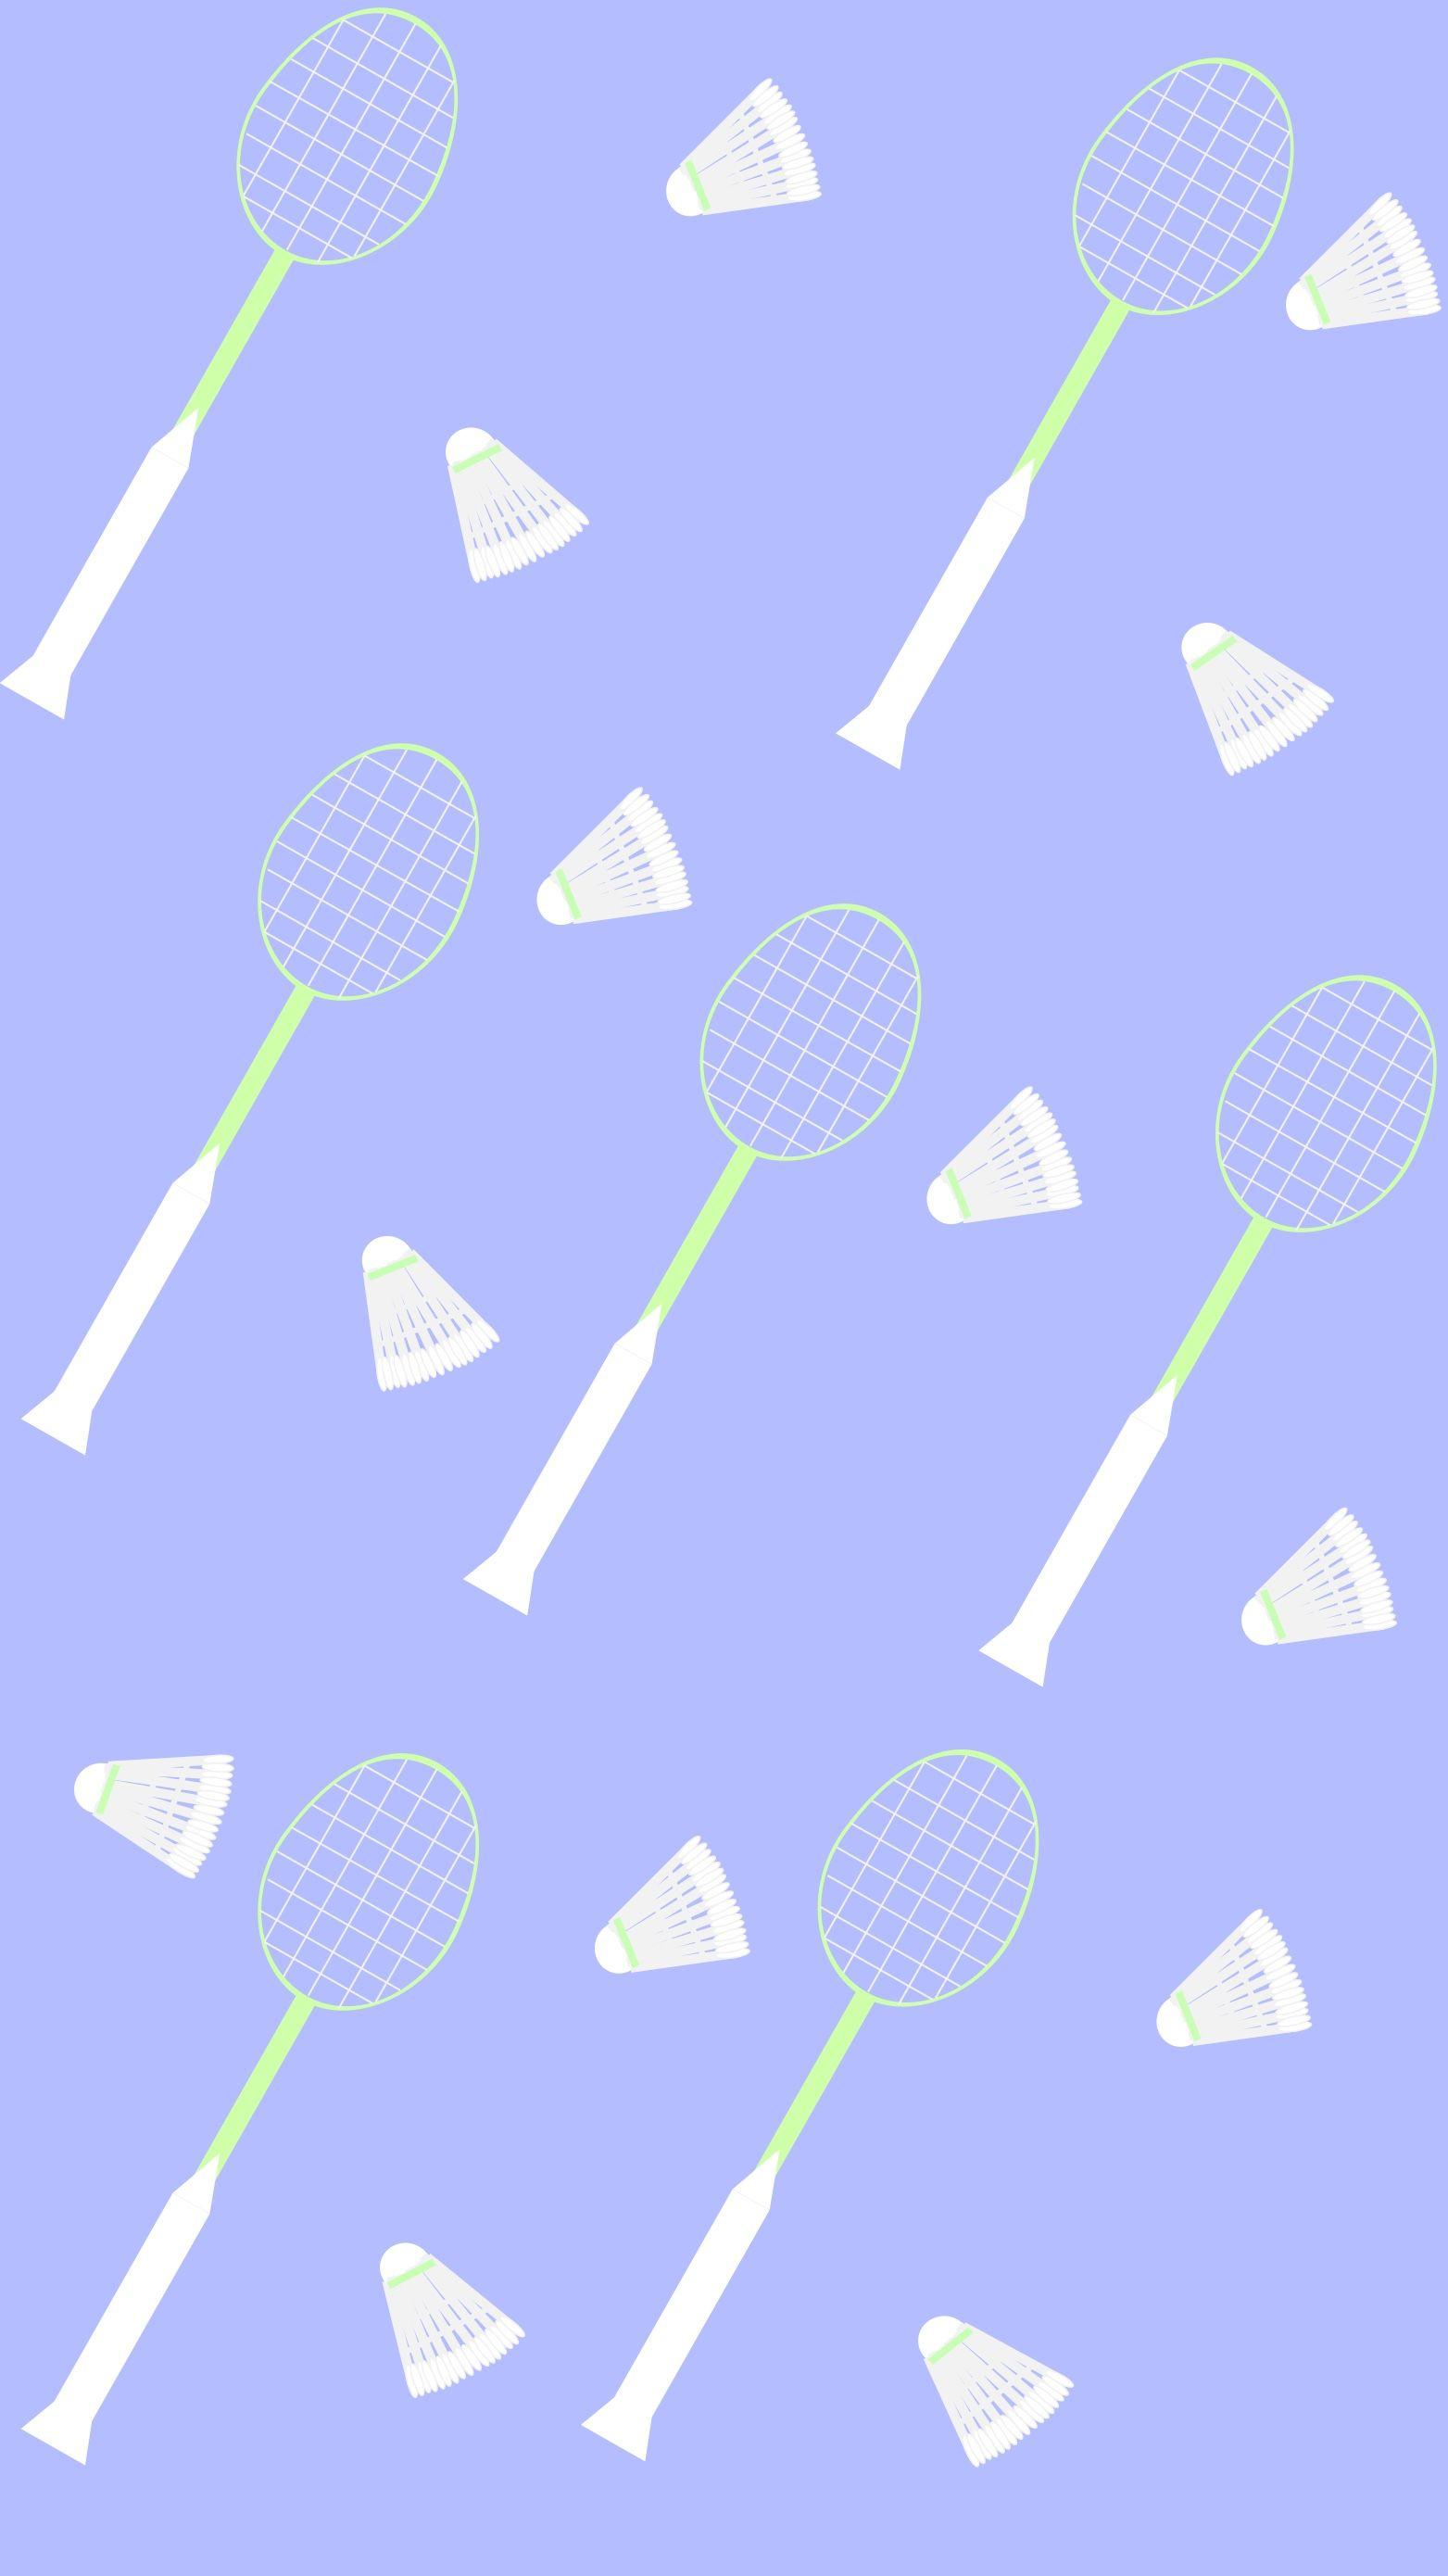 Badminton Iphone Wallpaper Made On Adobe Illustrator Wallpaper Background Wallpaperiphone Badminton Badminton Olahraga Gambar